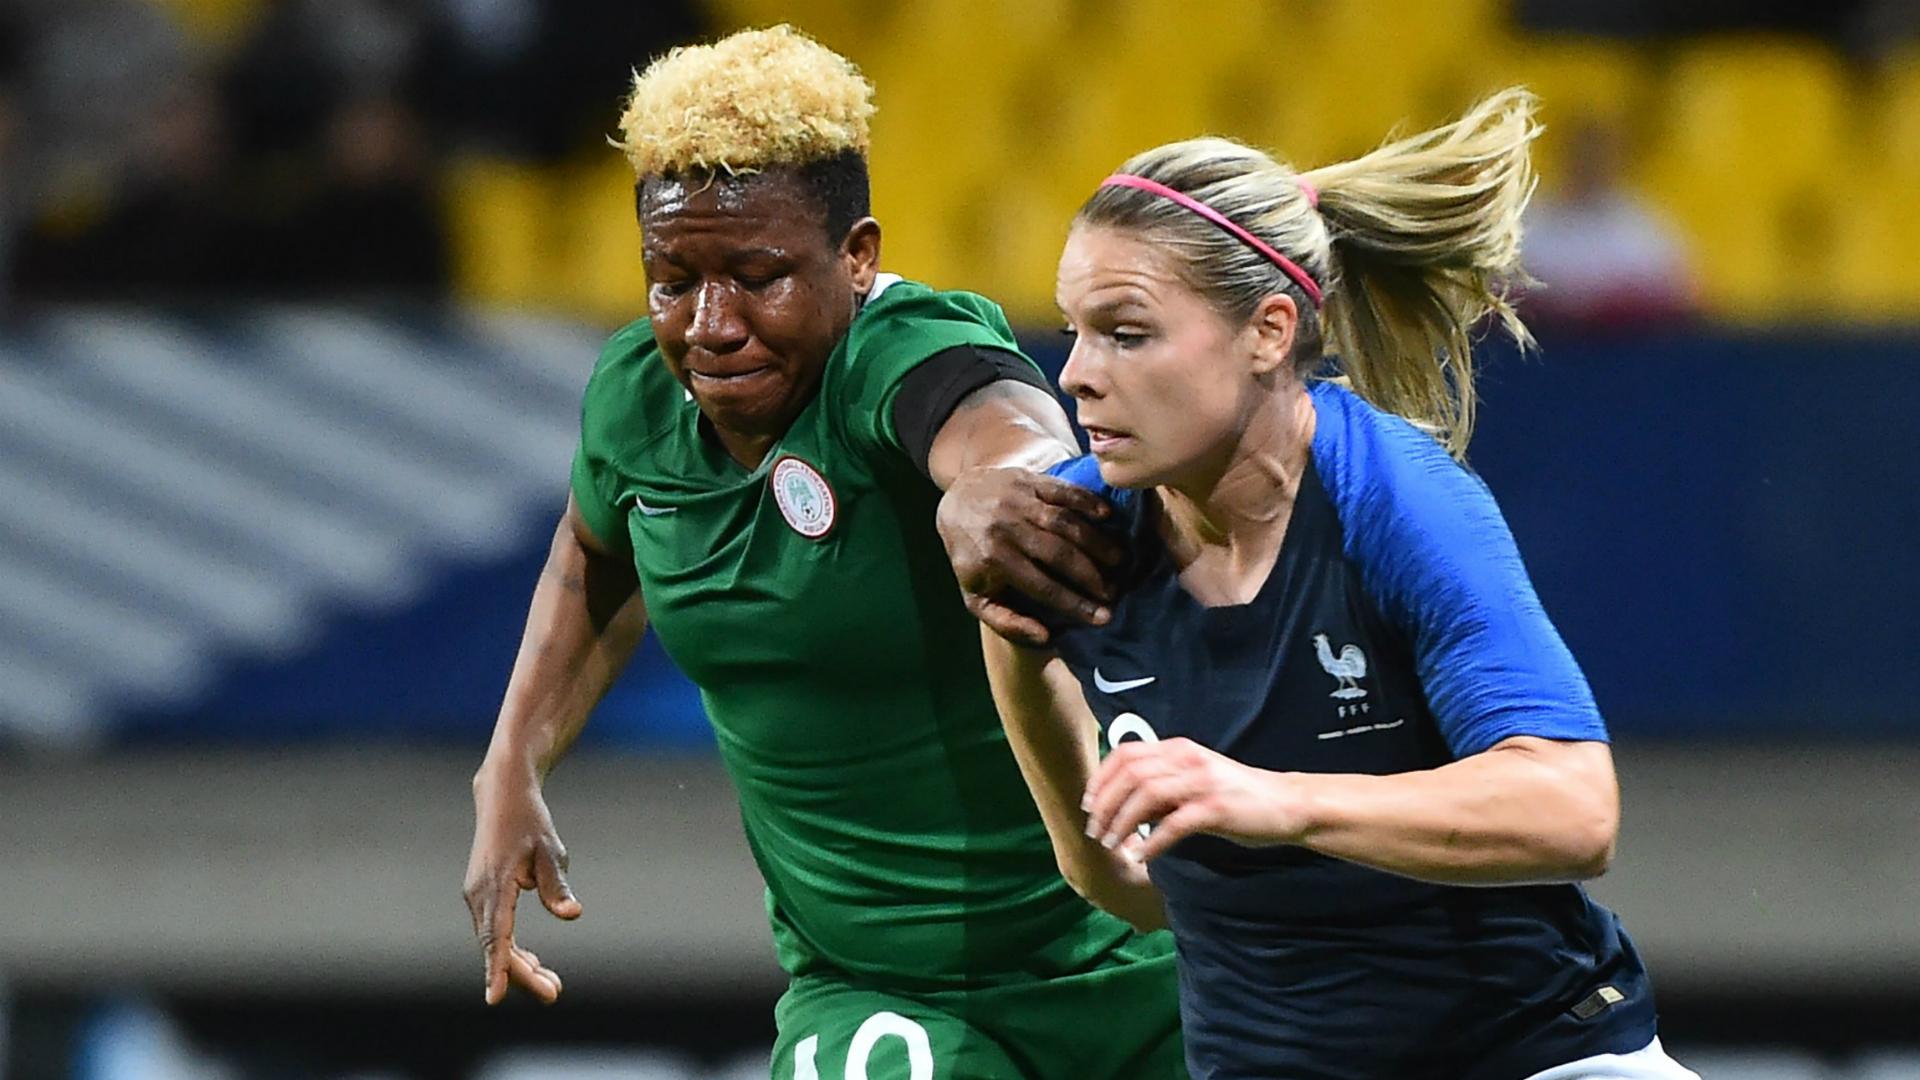 Chikwelu: Nigerian midfielder joins Spanish side Madrid